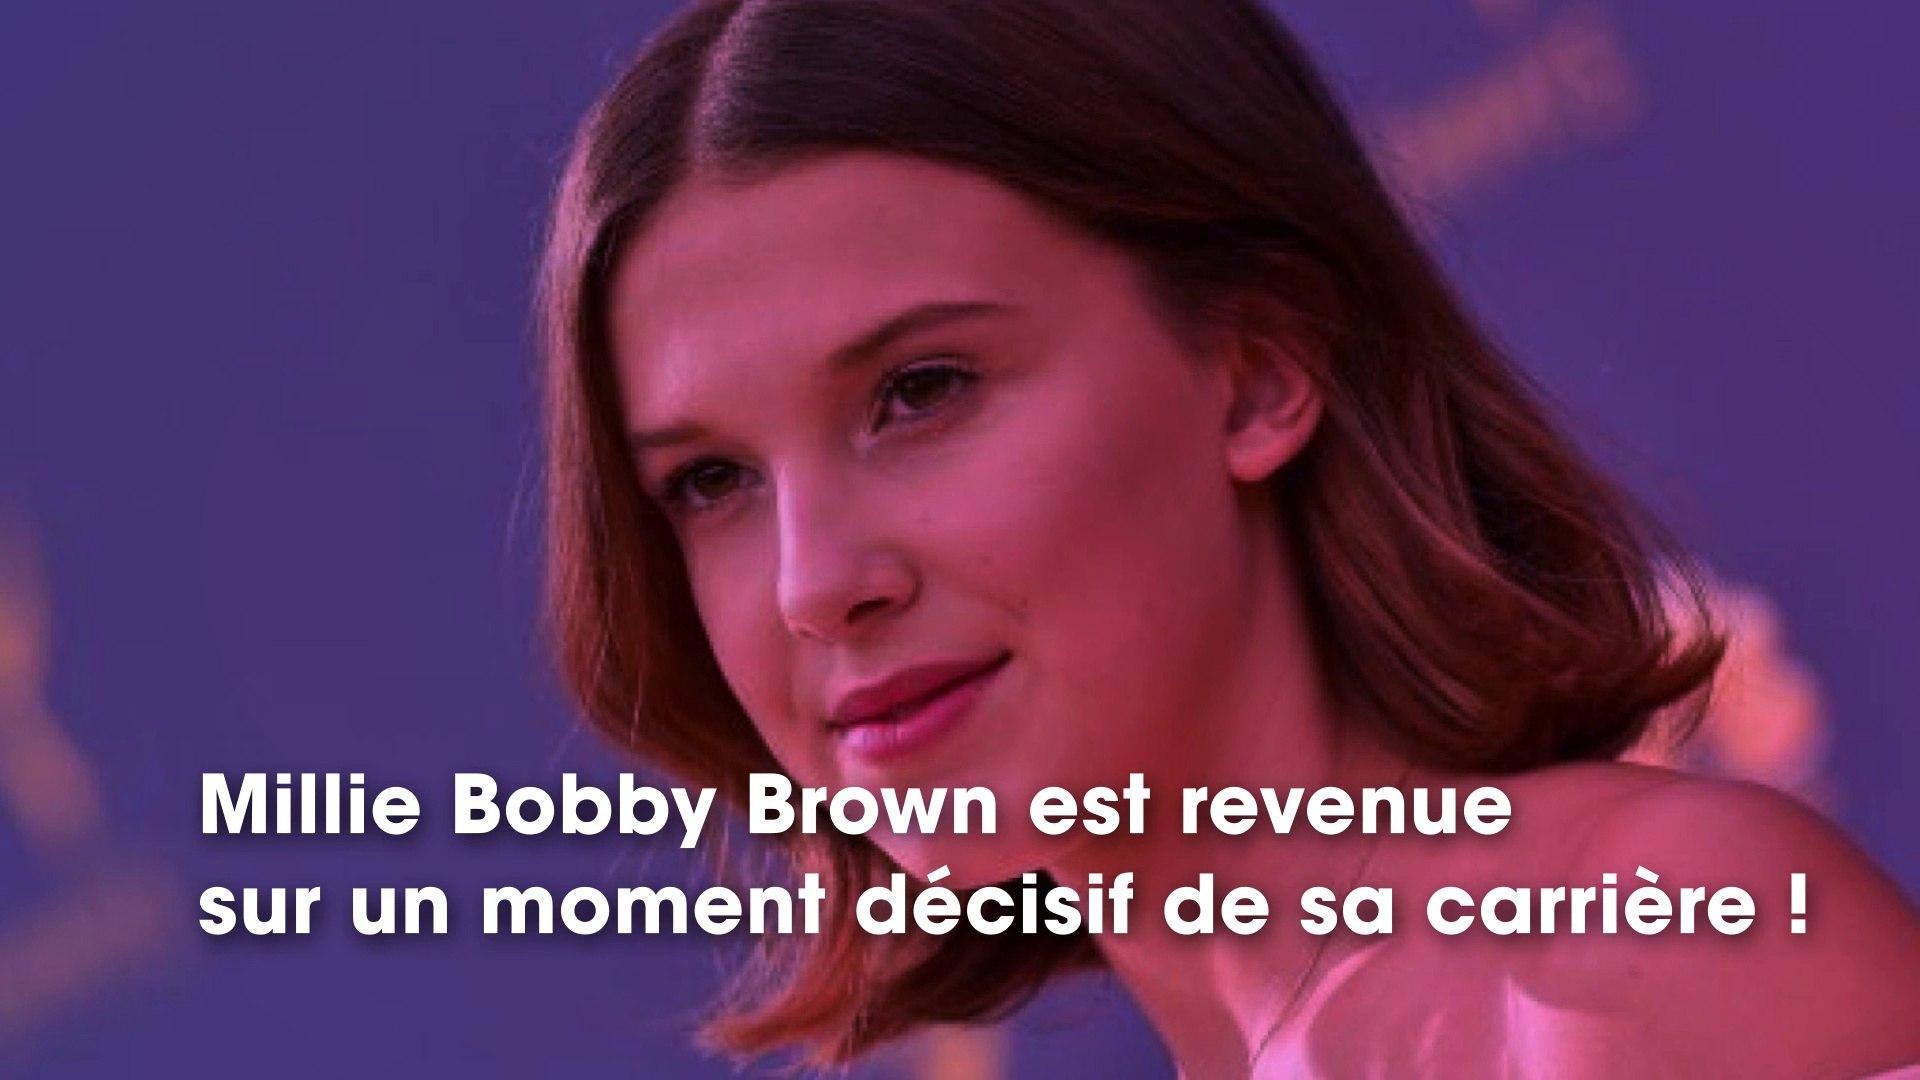 Millie Bobby Brown : recalée de Game of Thrones, elle a failli ne jamais jouer dans Stranger Things